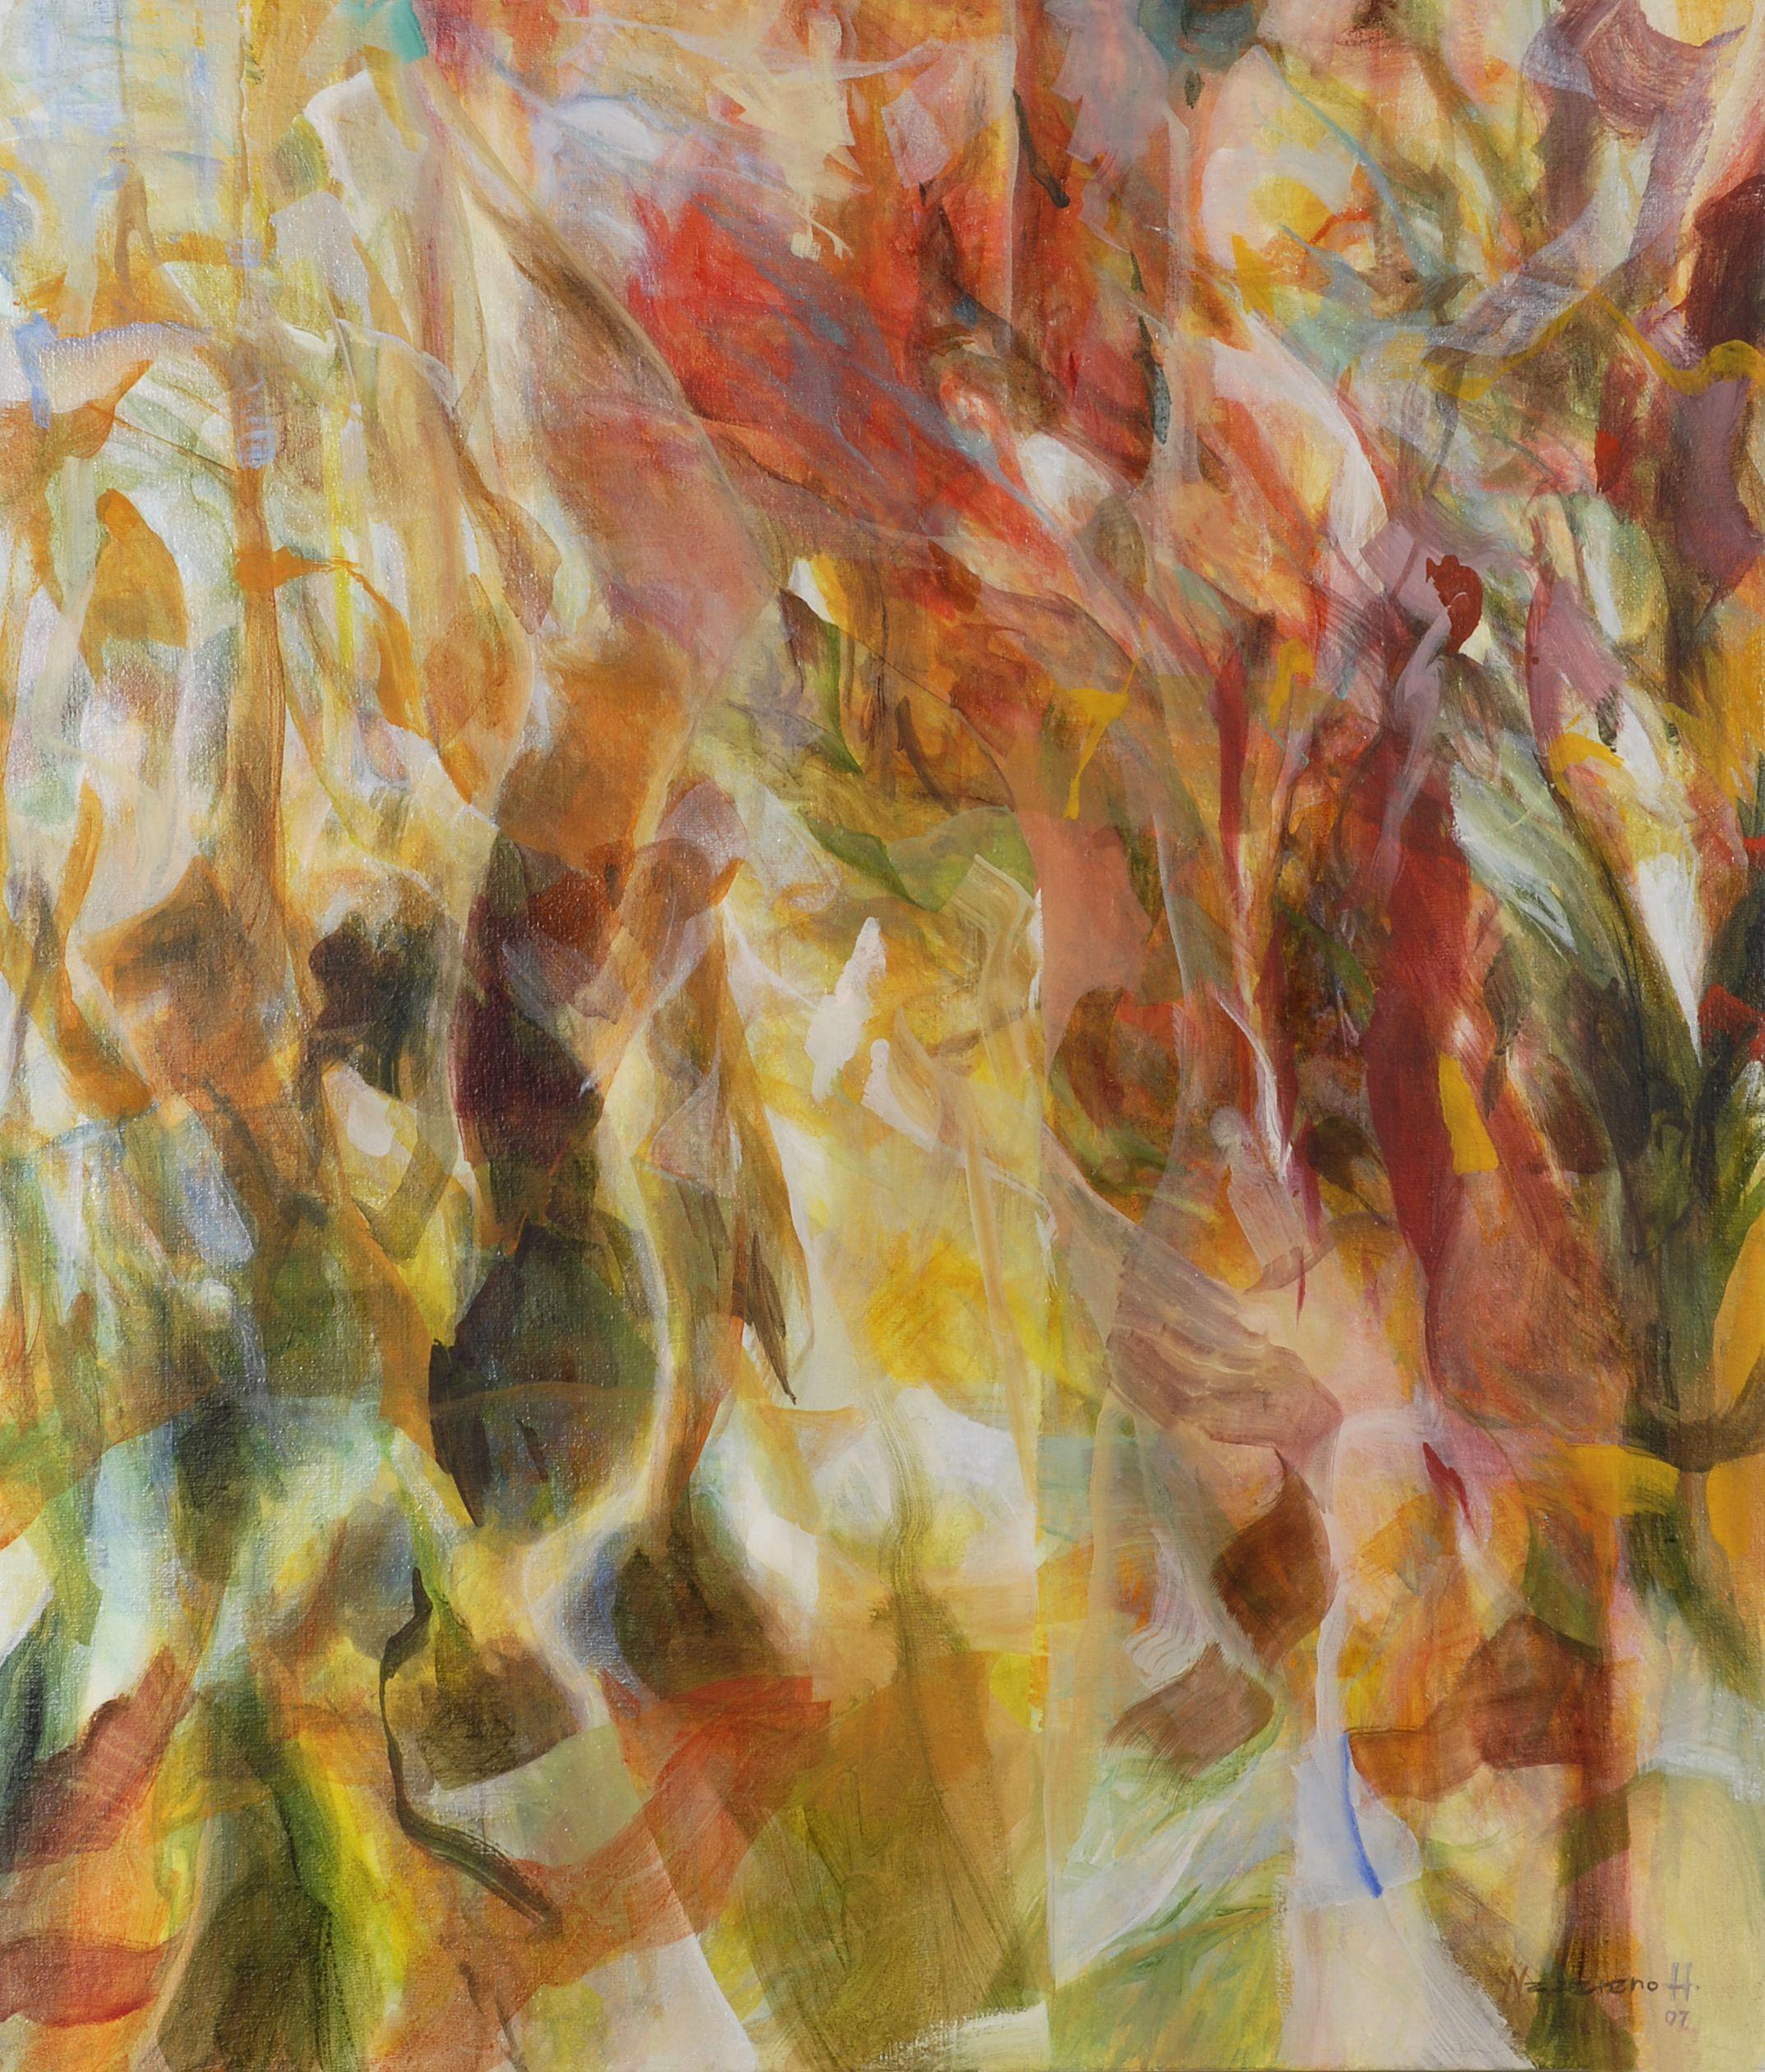 Oil on canvas 110 x 95 cm